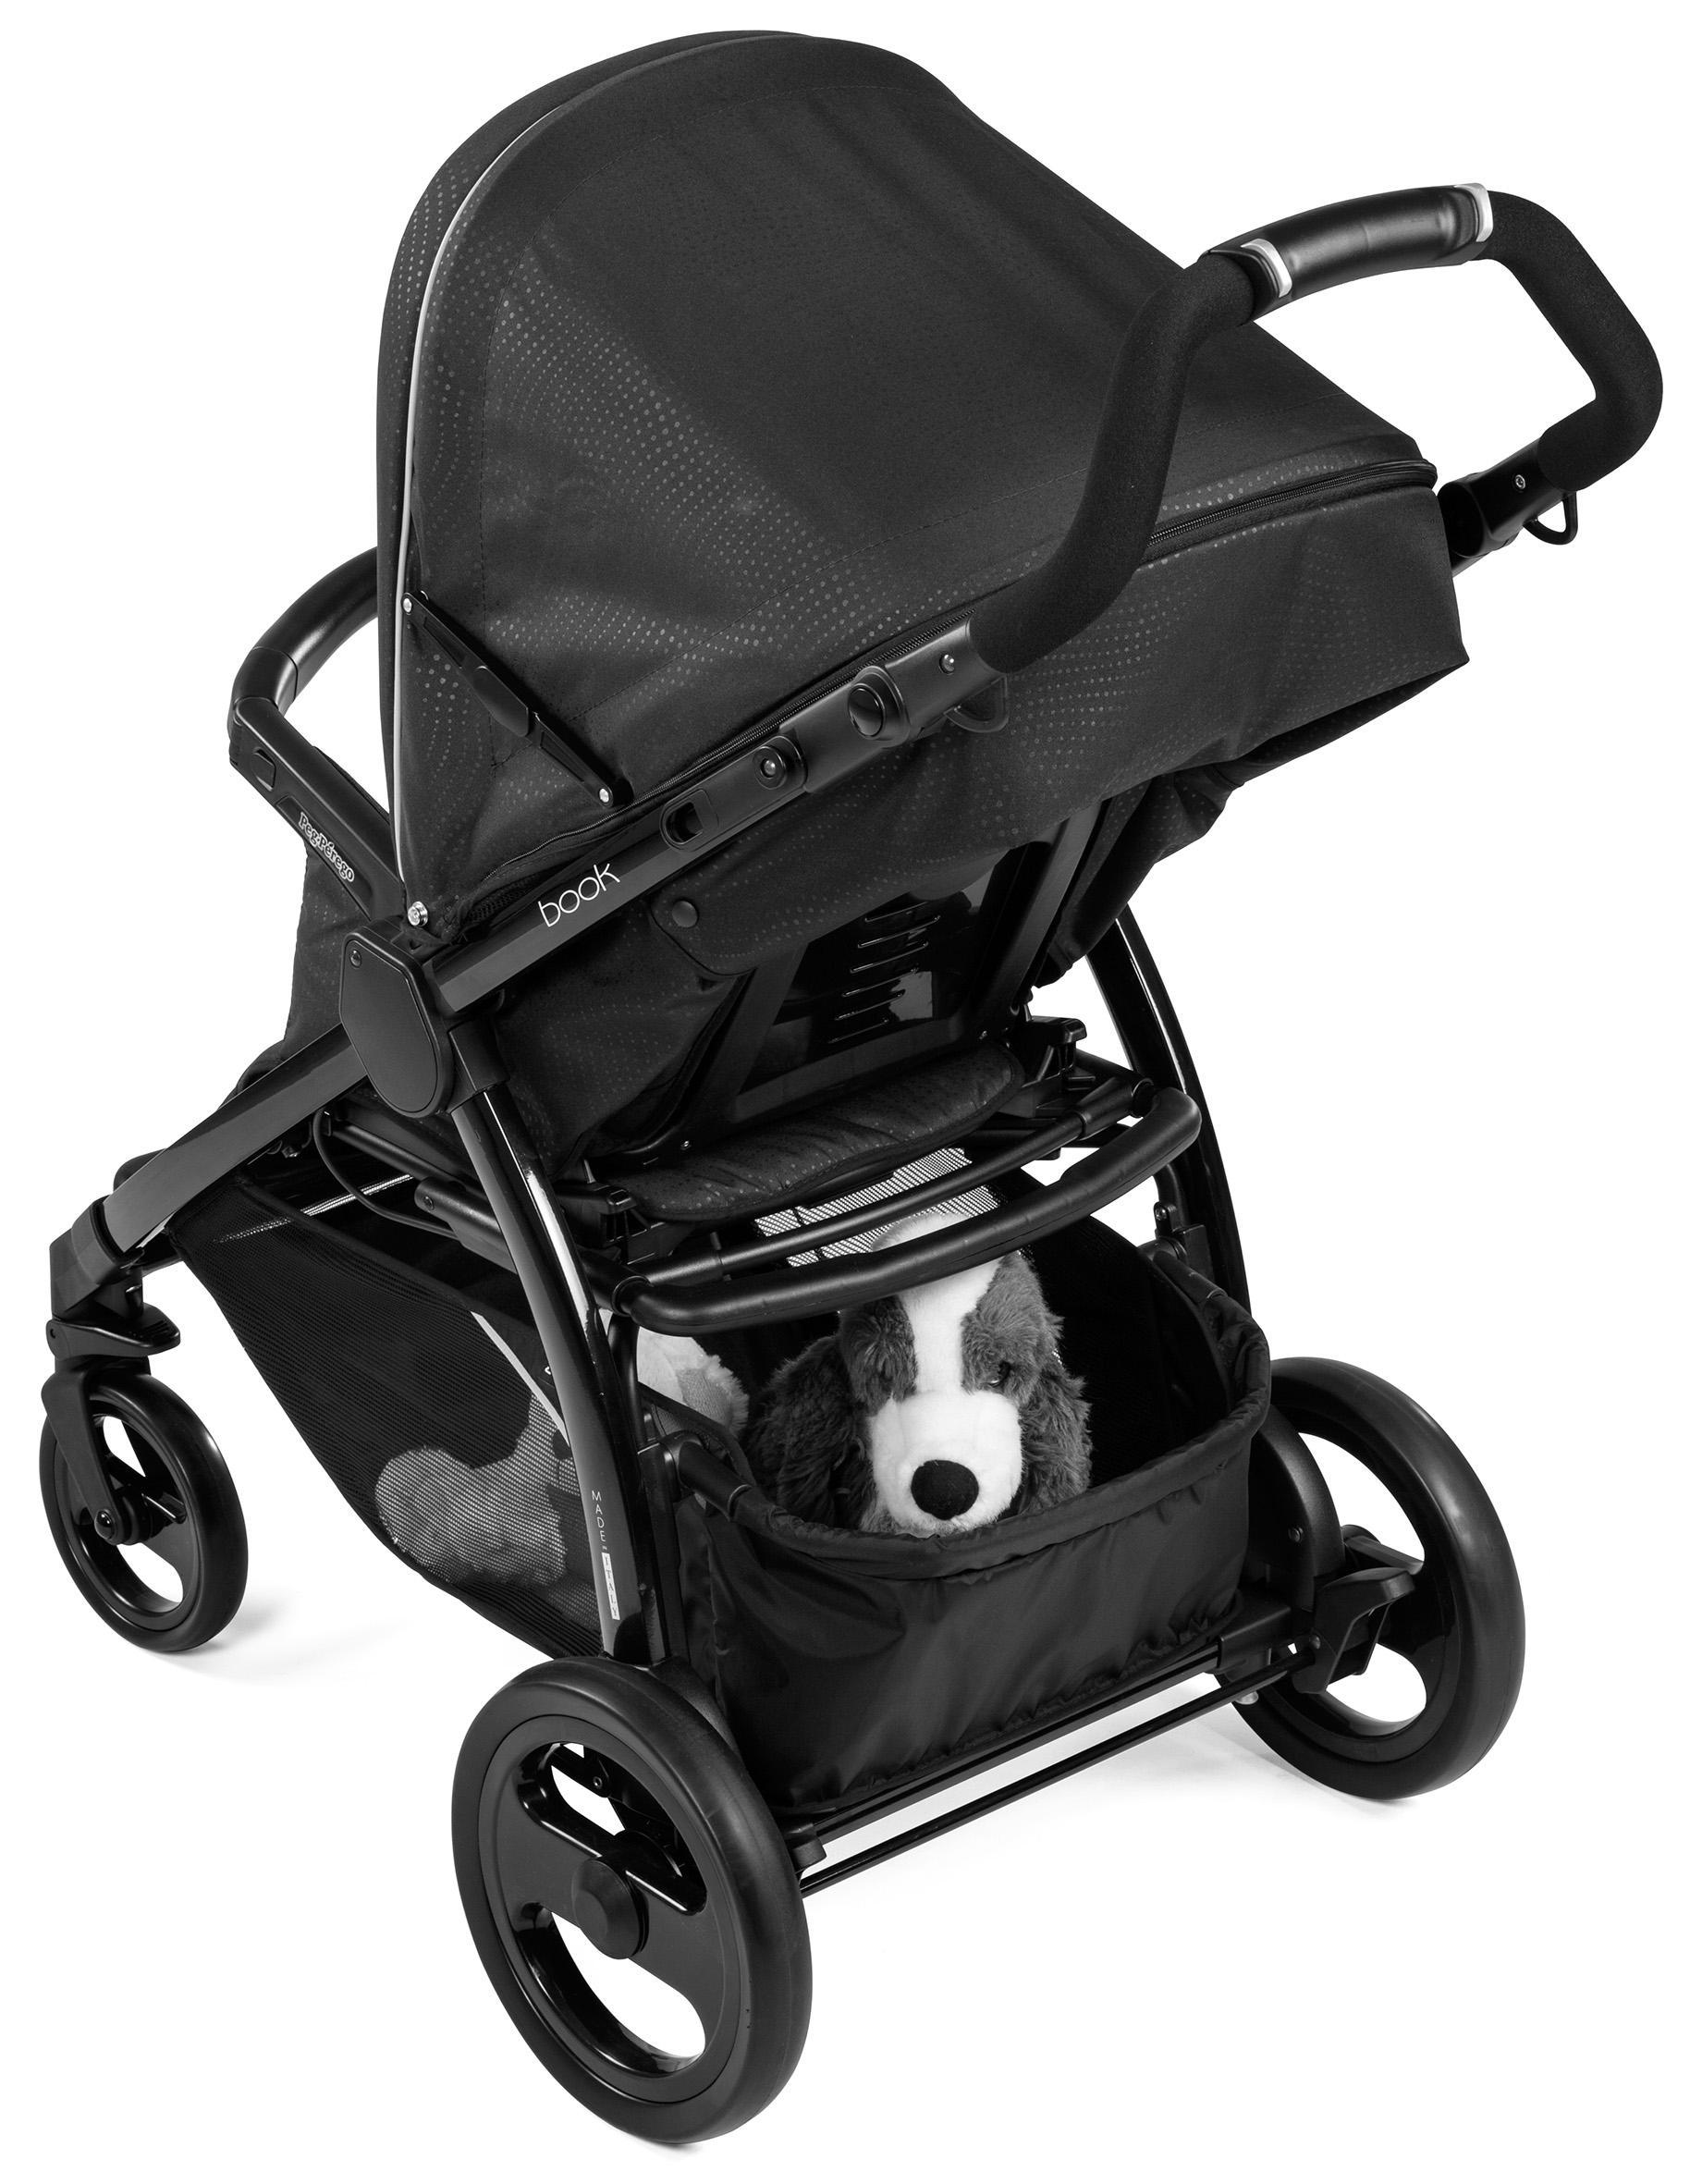 peg perego bbkcx1bkak komfort buggy book breeze kaki baby. Black Bedroom Furniture Sets. Home Design Ideas